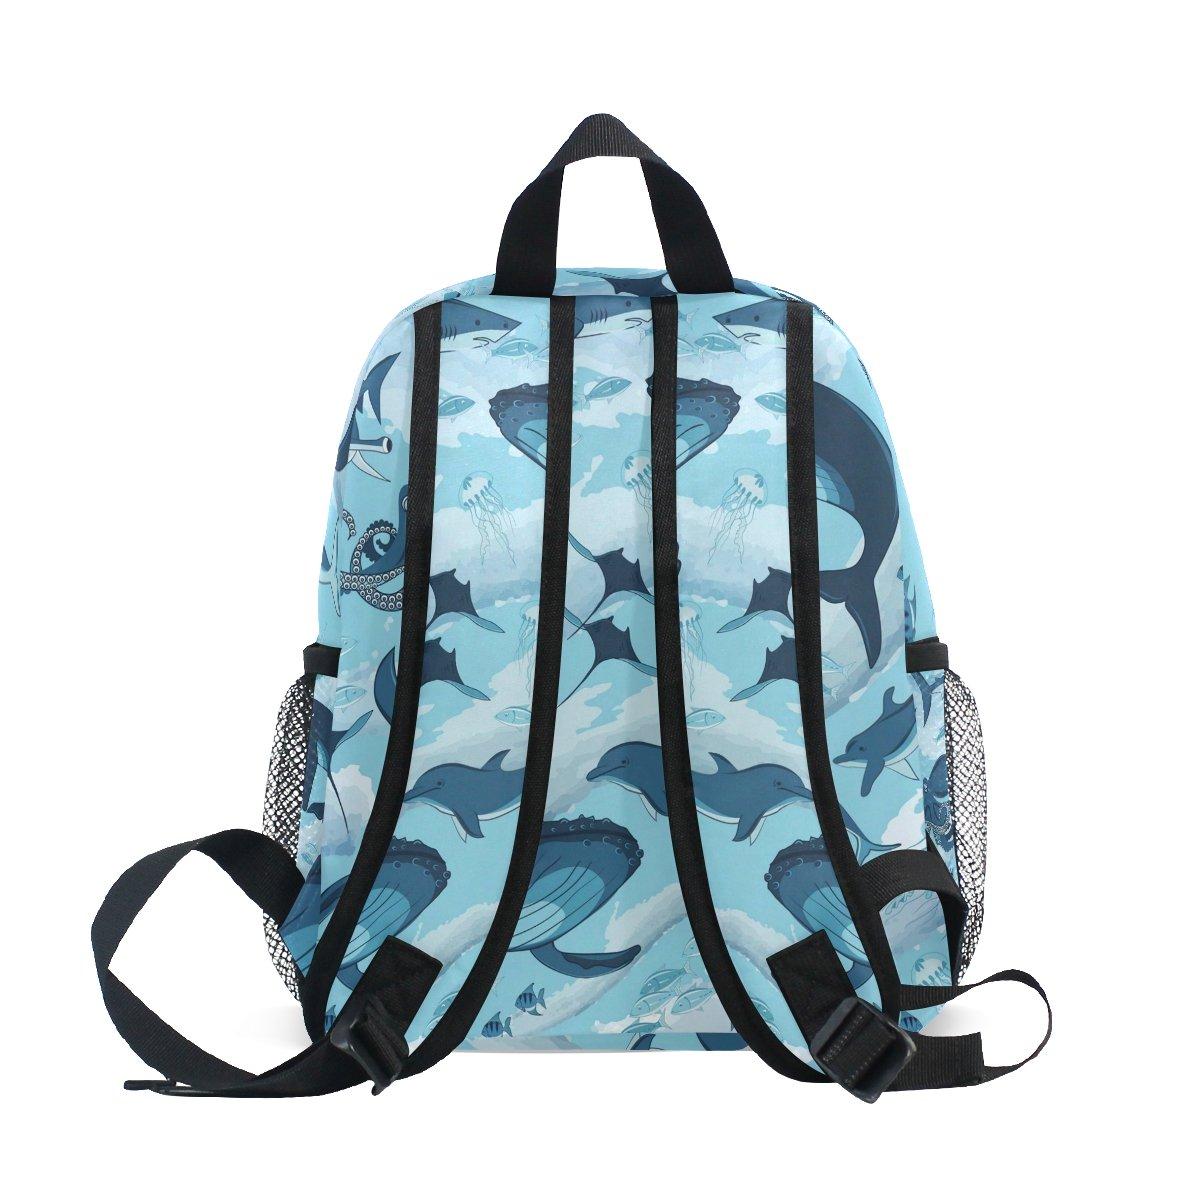 f414c081d124 TIZORAX Marine Shark Whale Octopus Dolphin Jellyfish Lightweight Travel  School Backpack for Boys Girls Kids  Amazon.co.uk  Luggage